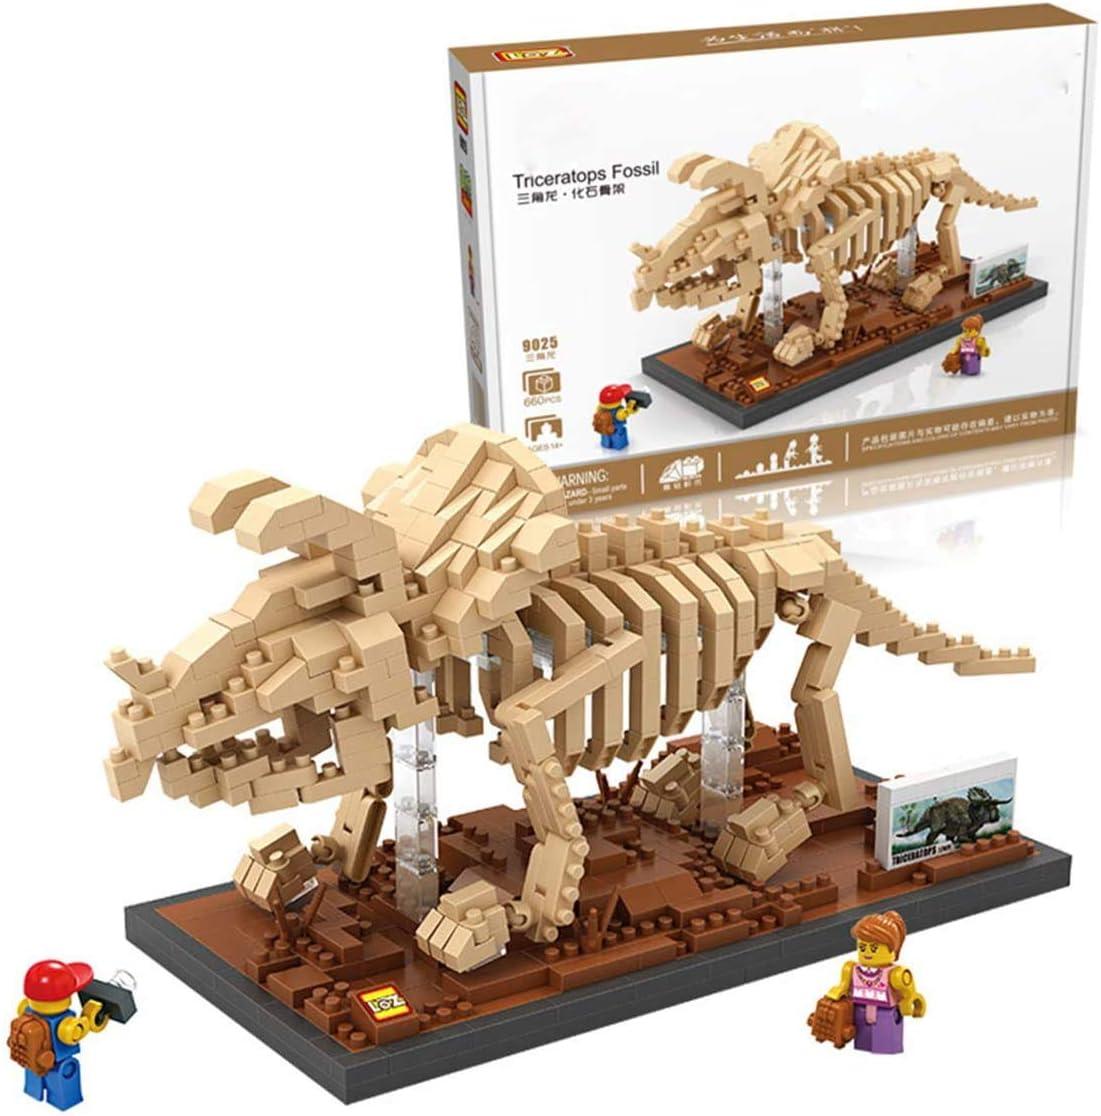 LAL6 Bloques De Construcción, Fósil De Dinosaurio Esqueleto Nano Micro Bloques 3D Puzzle Bricolaje Juguete Juguetes Modelo De Ladrillo, Nano-Mini Building Blocks Juguetes De DIY Niños (660pcs)